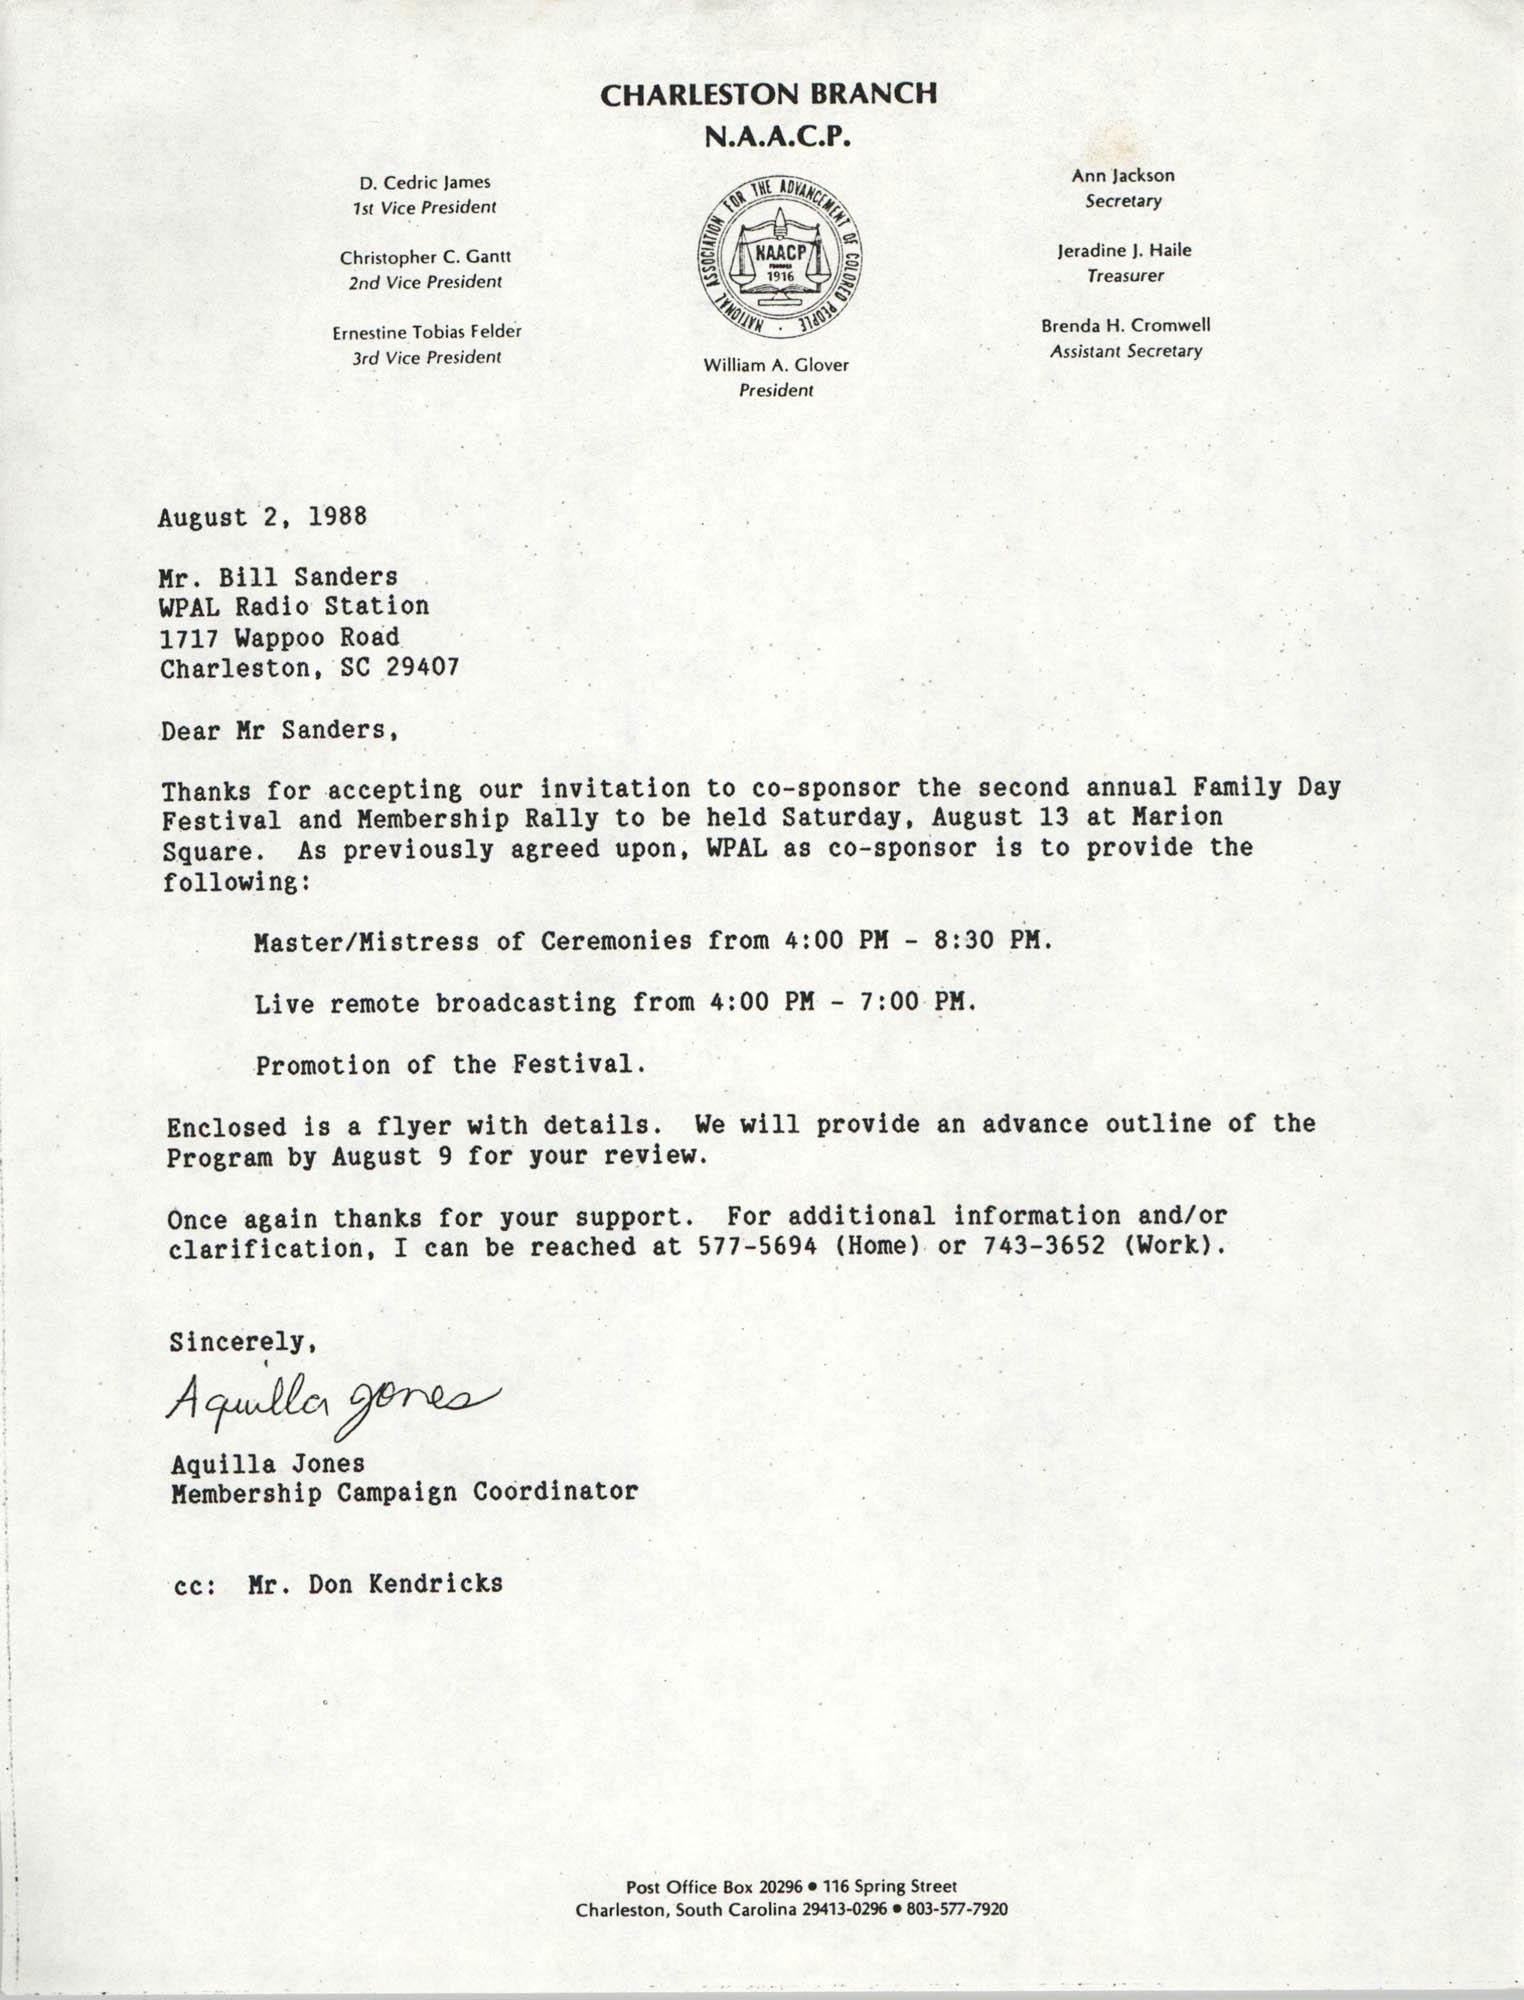 Letter from Aquilla Jones to Bill Sanders, August 2, 1988